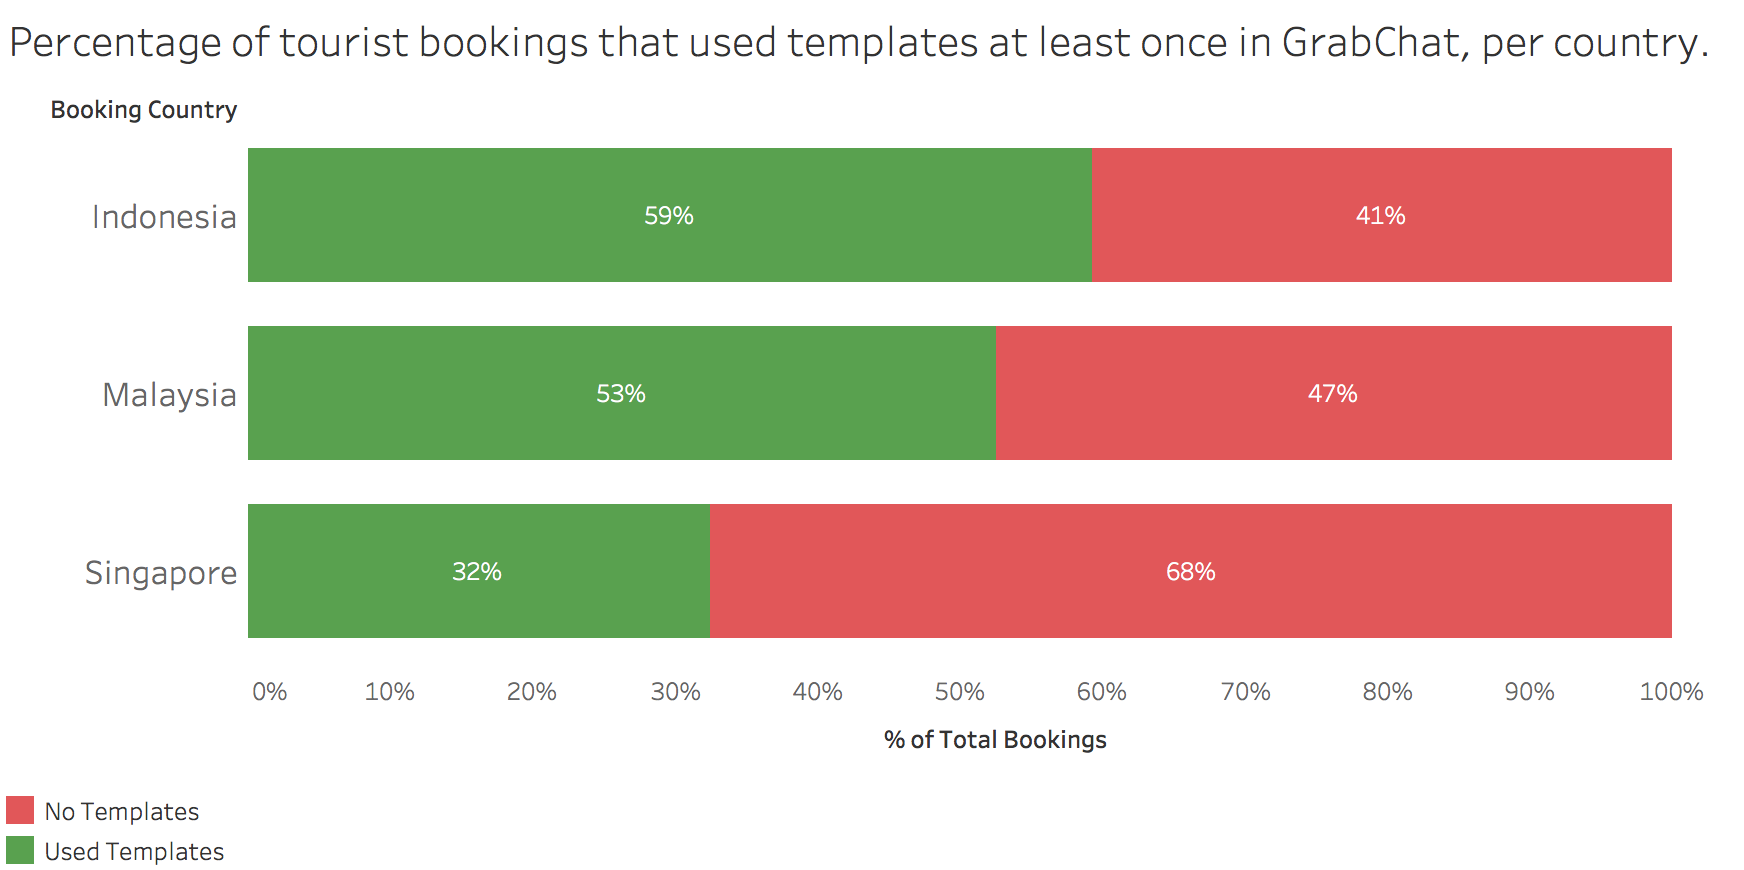 Template message usage percentage